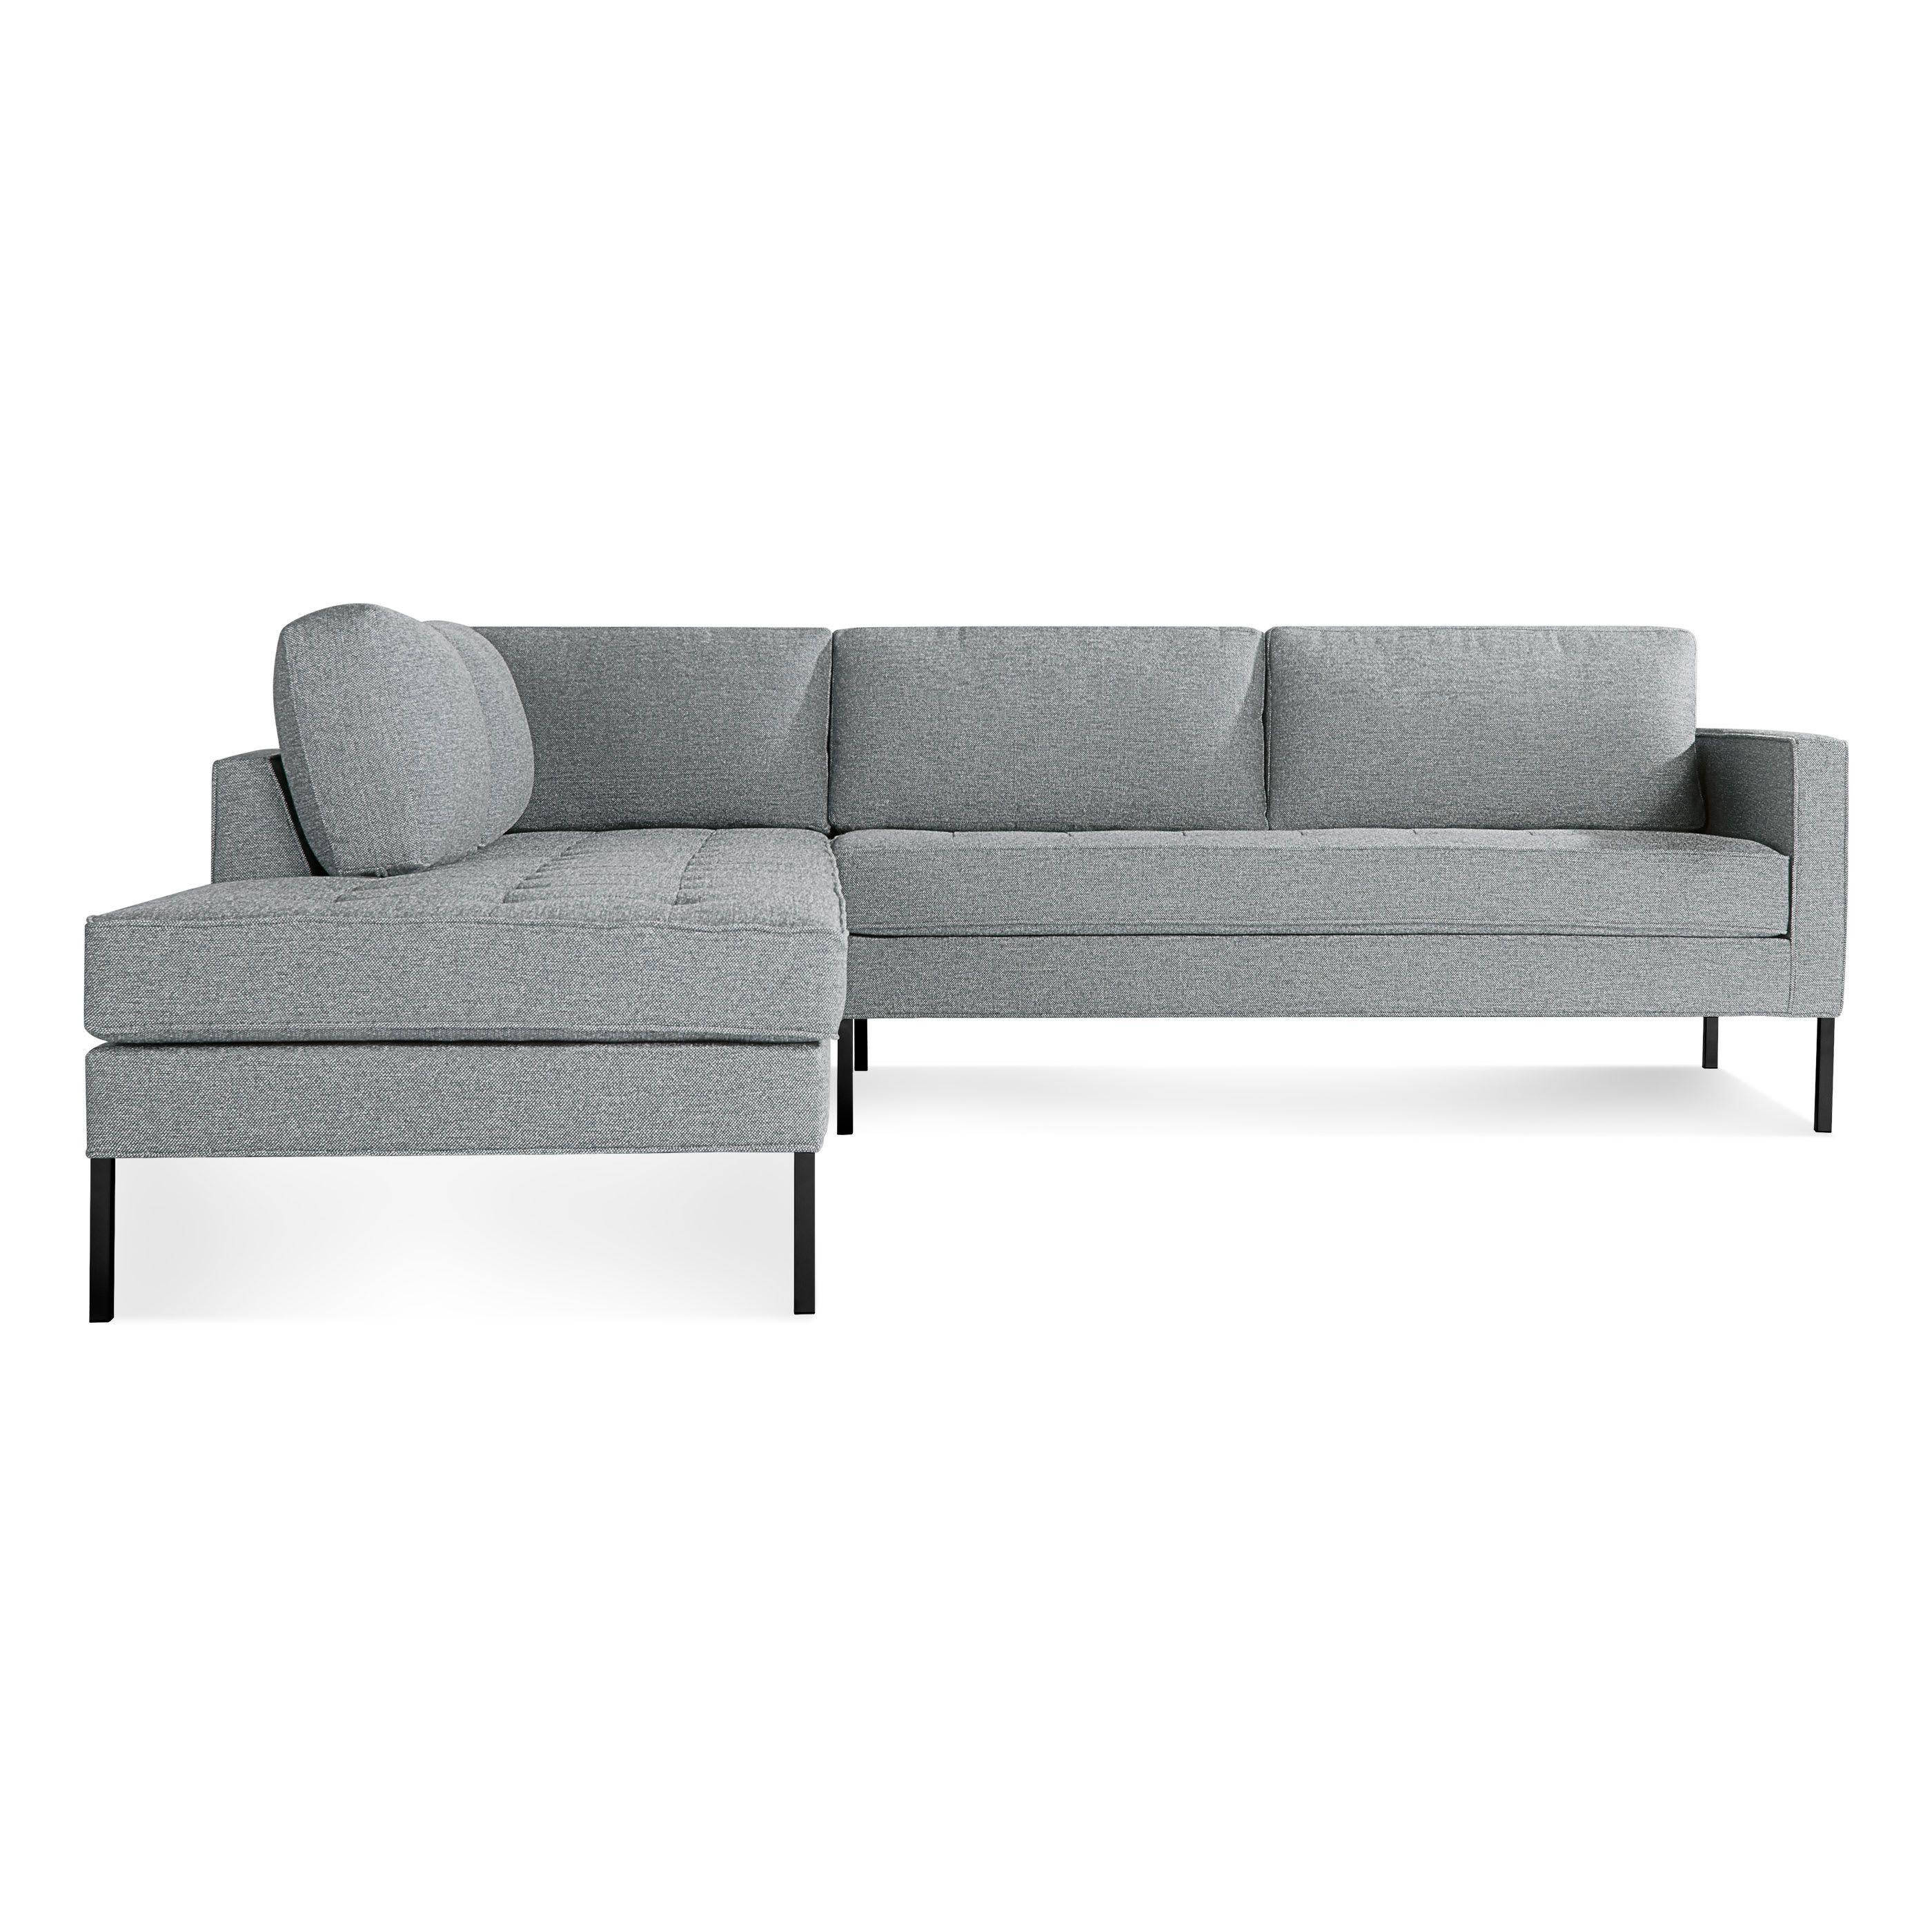 Paramount Left Sectional Sofa, Sanford Black / Metal | home ...